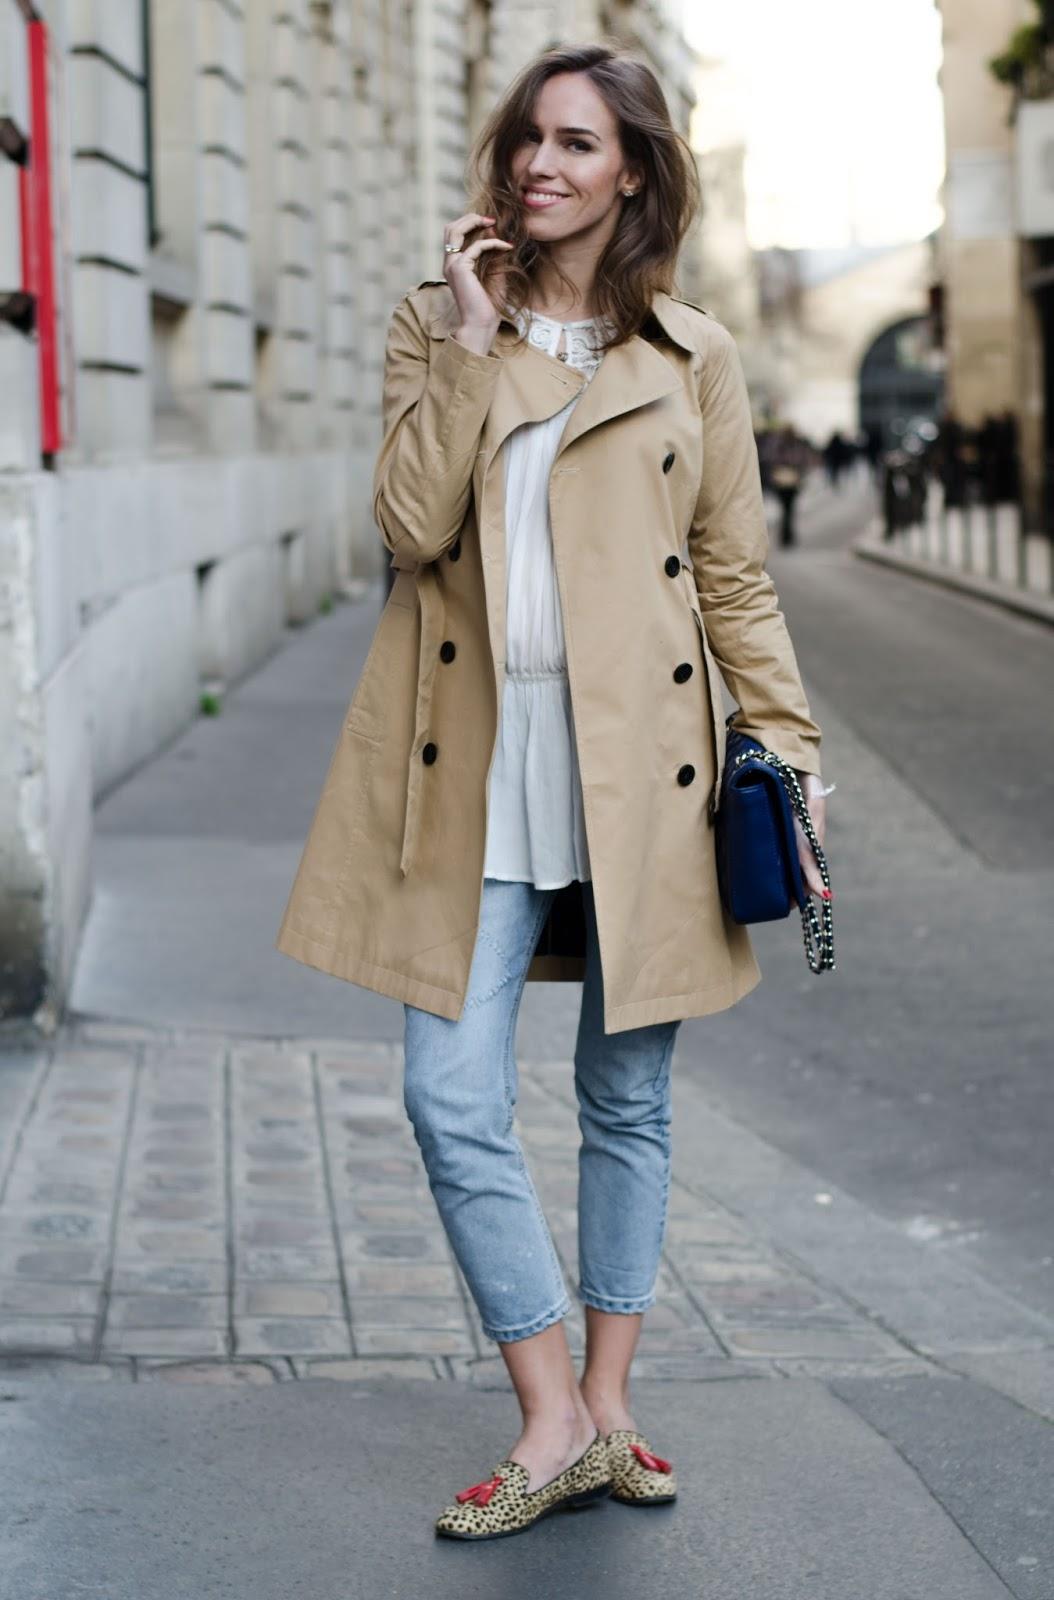 kristjaana mere paris spring 2016 street style trench coat